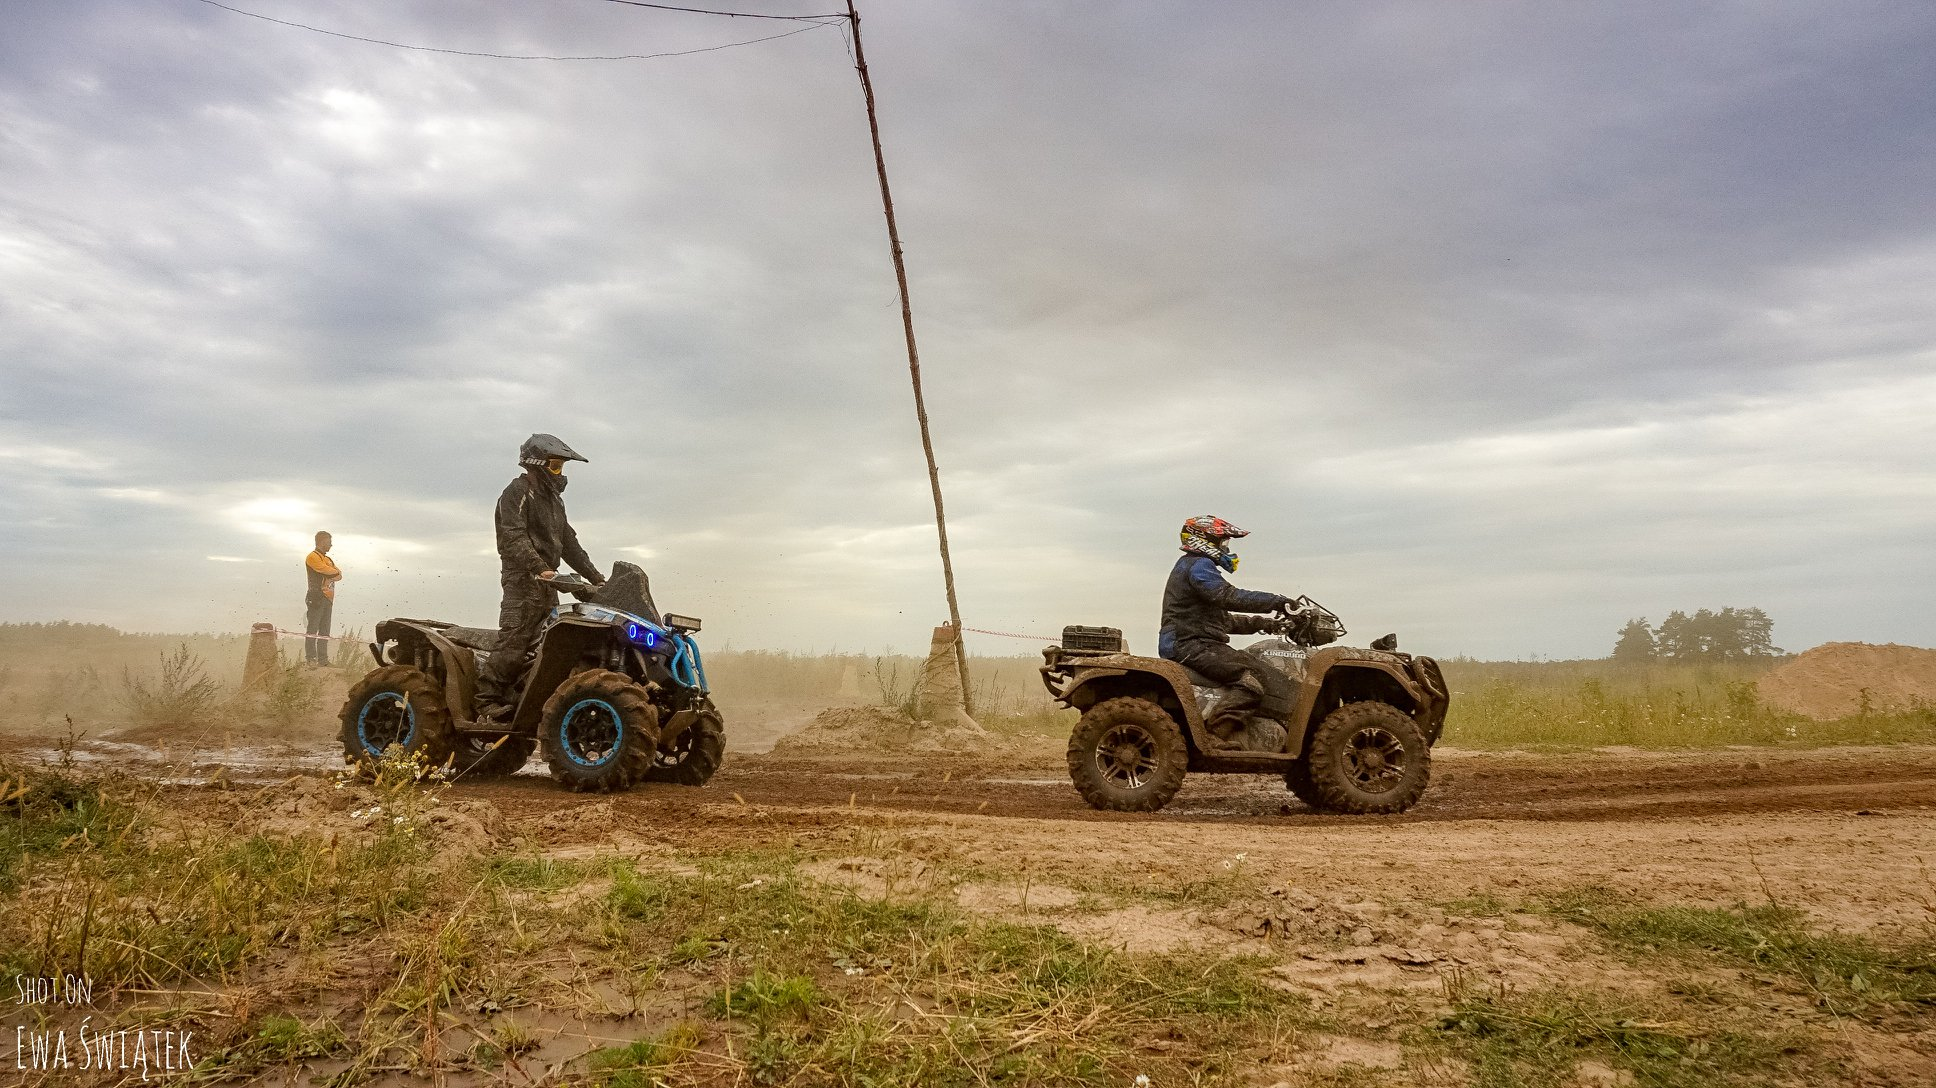 rajdy, rajdy motocyklowe, enduro rally, enduro rally 24, enduro rally 24 2019, giżycko, tenere 700, ktm 790 adventure,